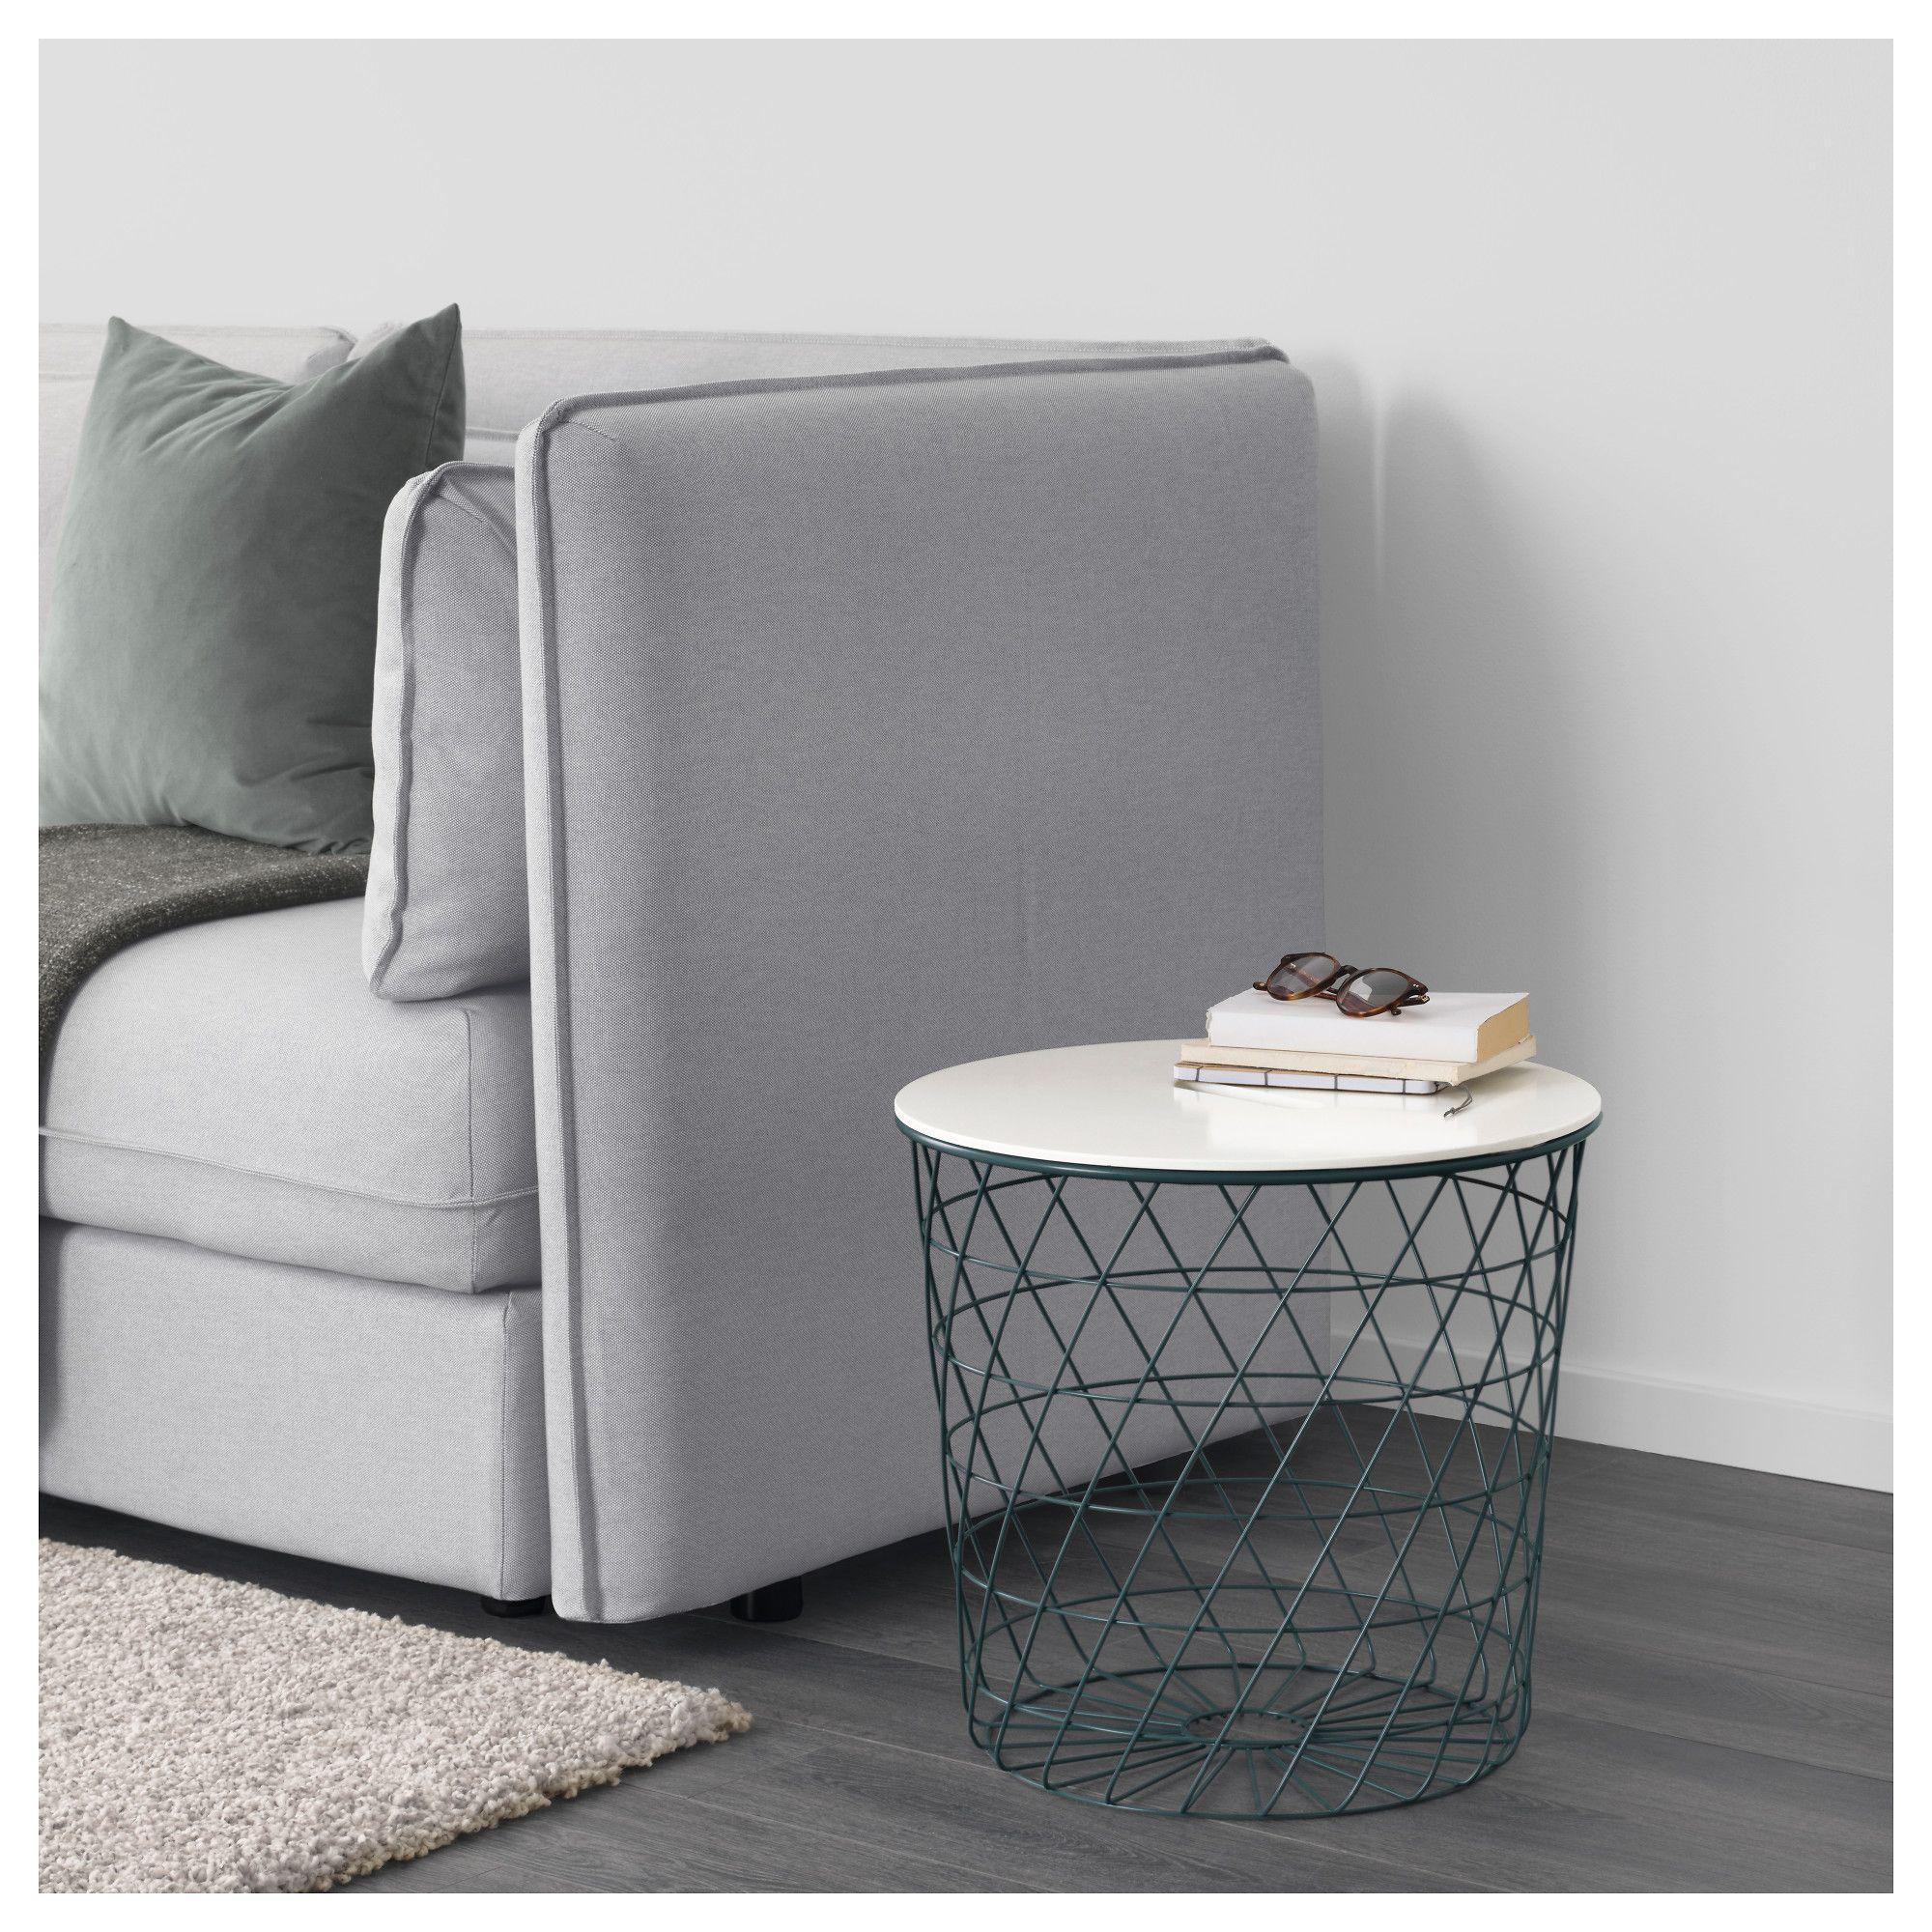 e56e52651ee890b31841b216c1c6ad5f Top Result 50 Luxury Black and White Coffee Table Image 2017 Shdy7